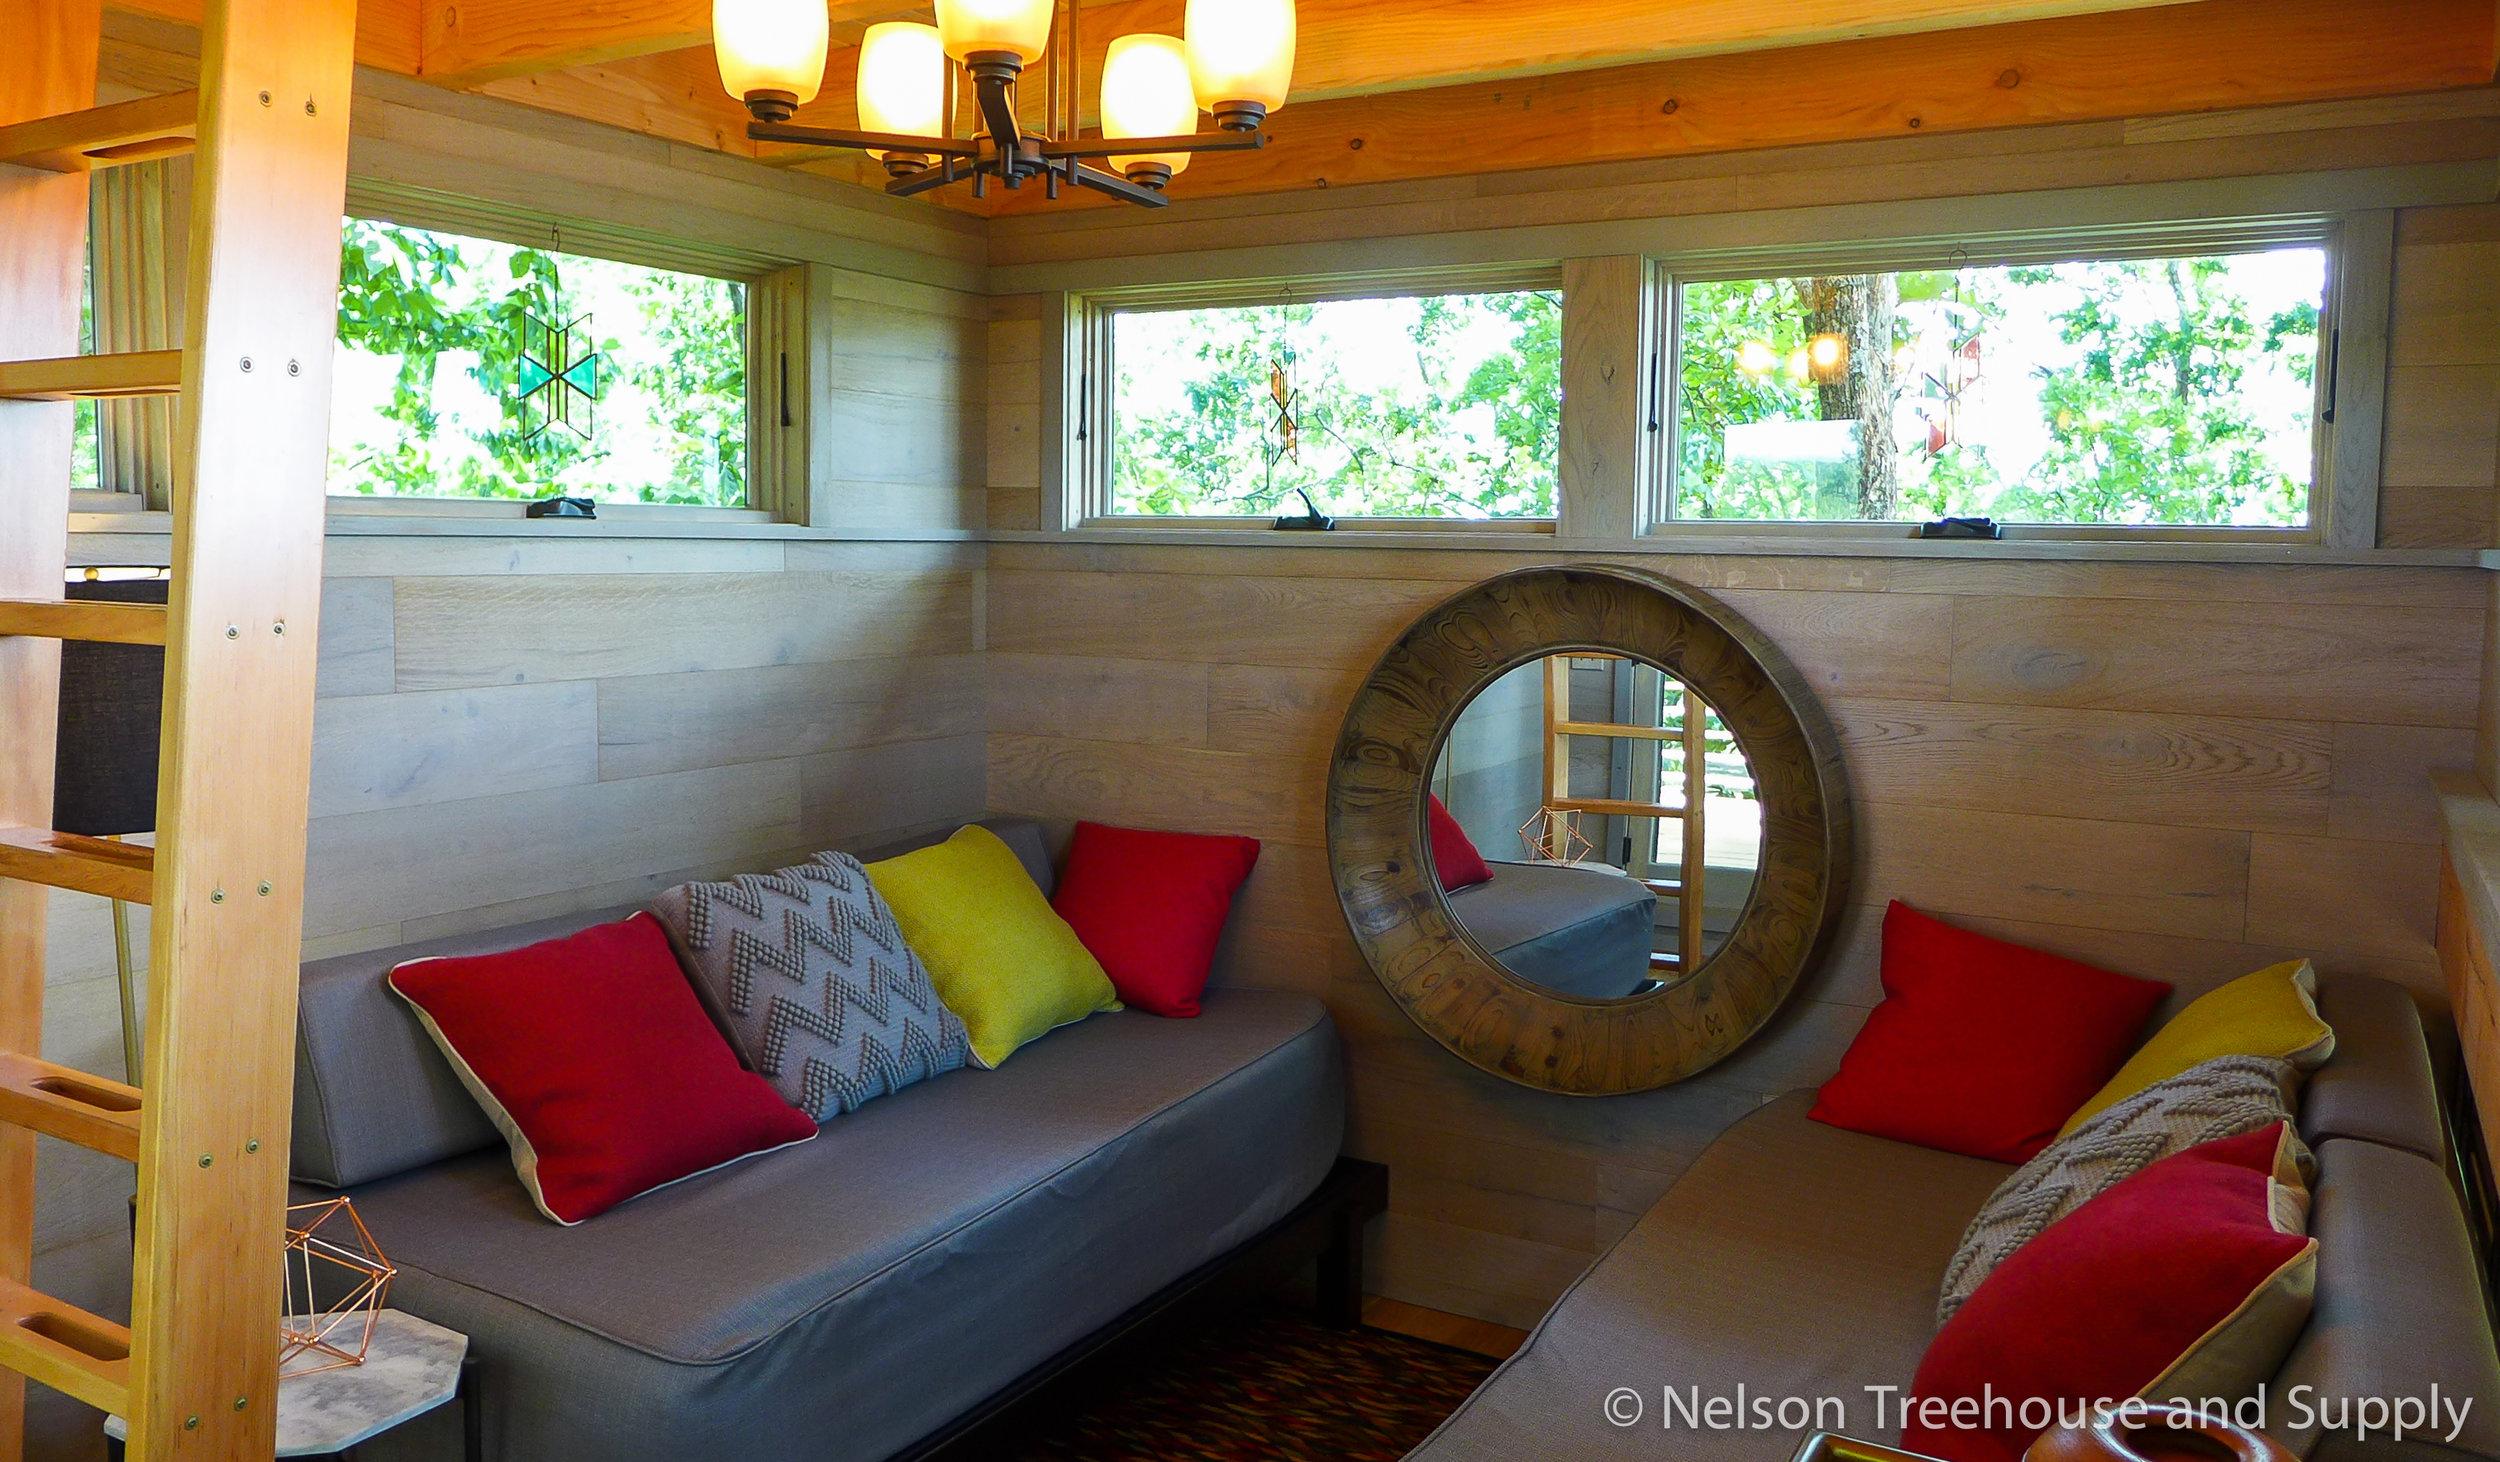 frank-lloyd-wright-treehouse-lounge